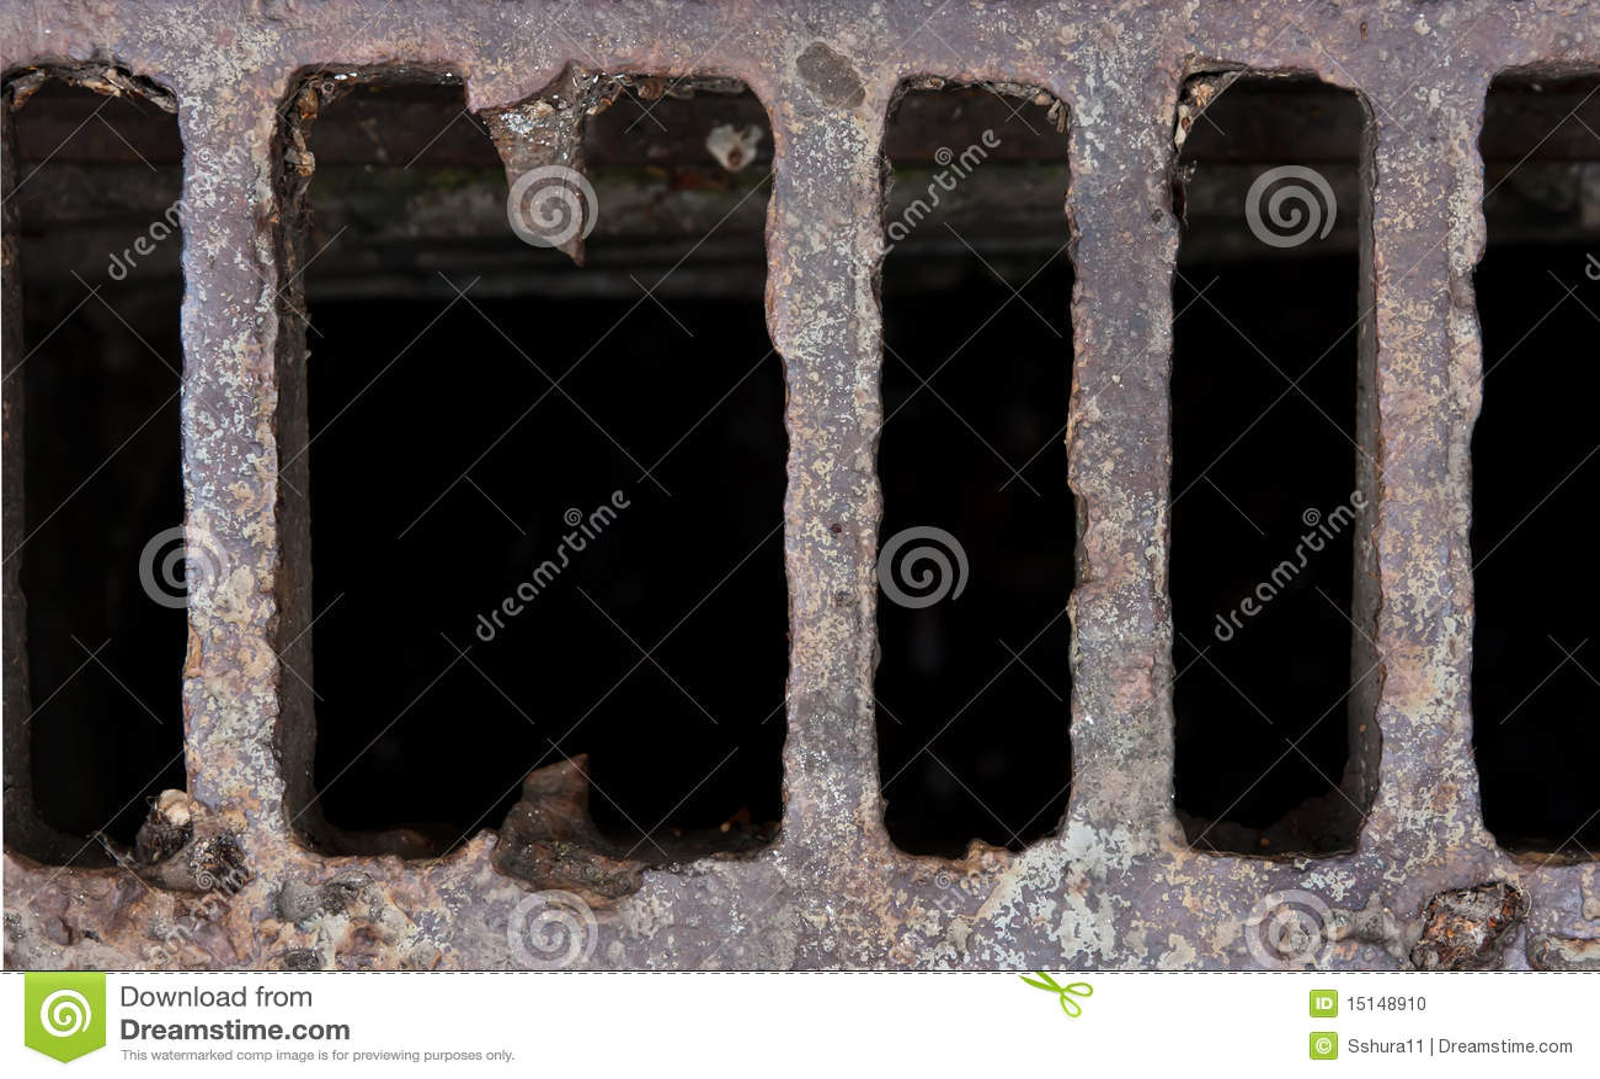 Grid manhole cover